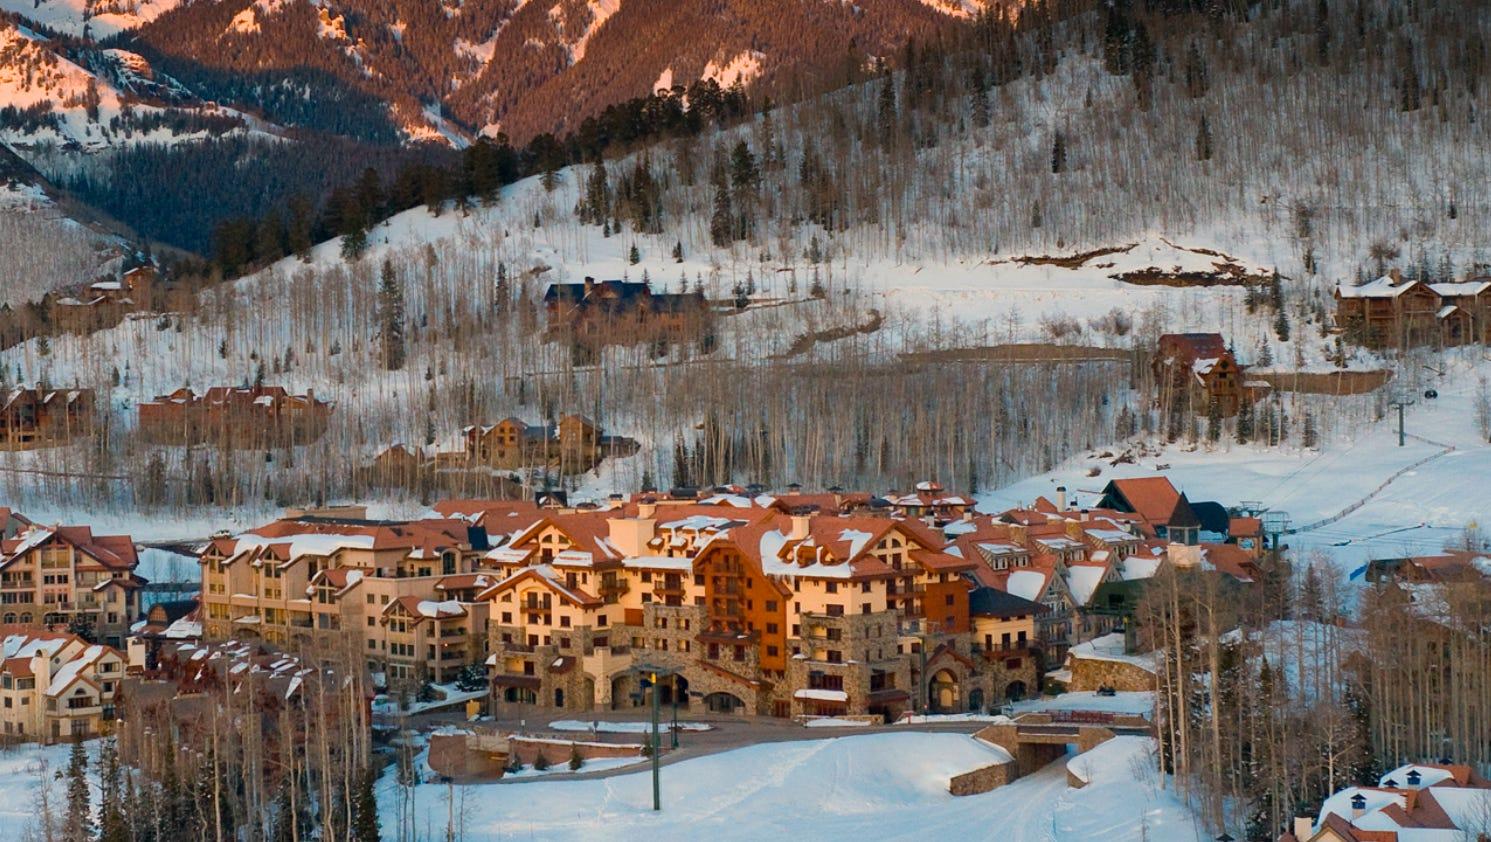 telluride mountain village hotels dining shopping telluride mountain village hotels